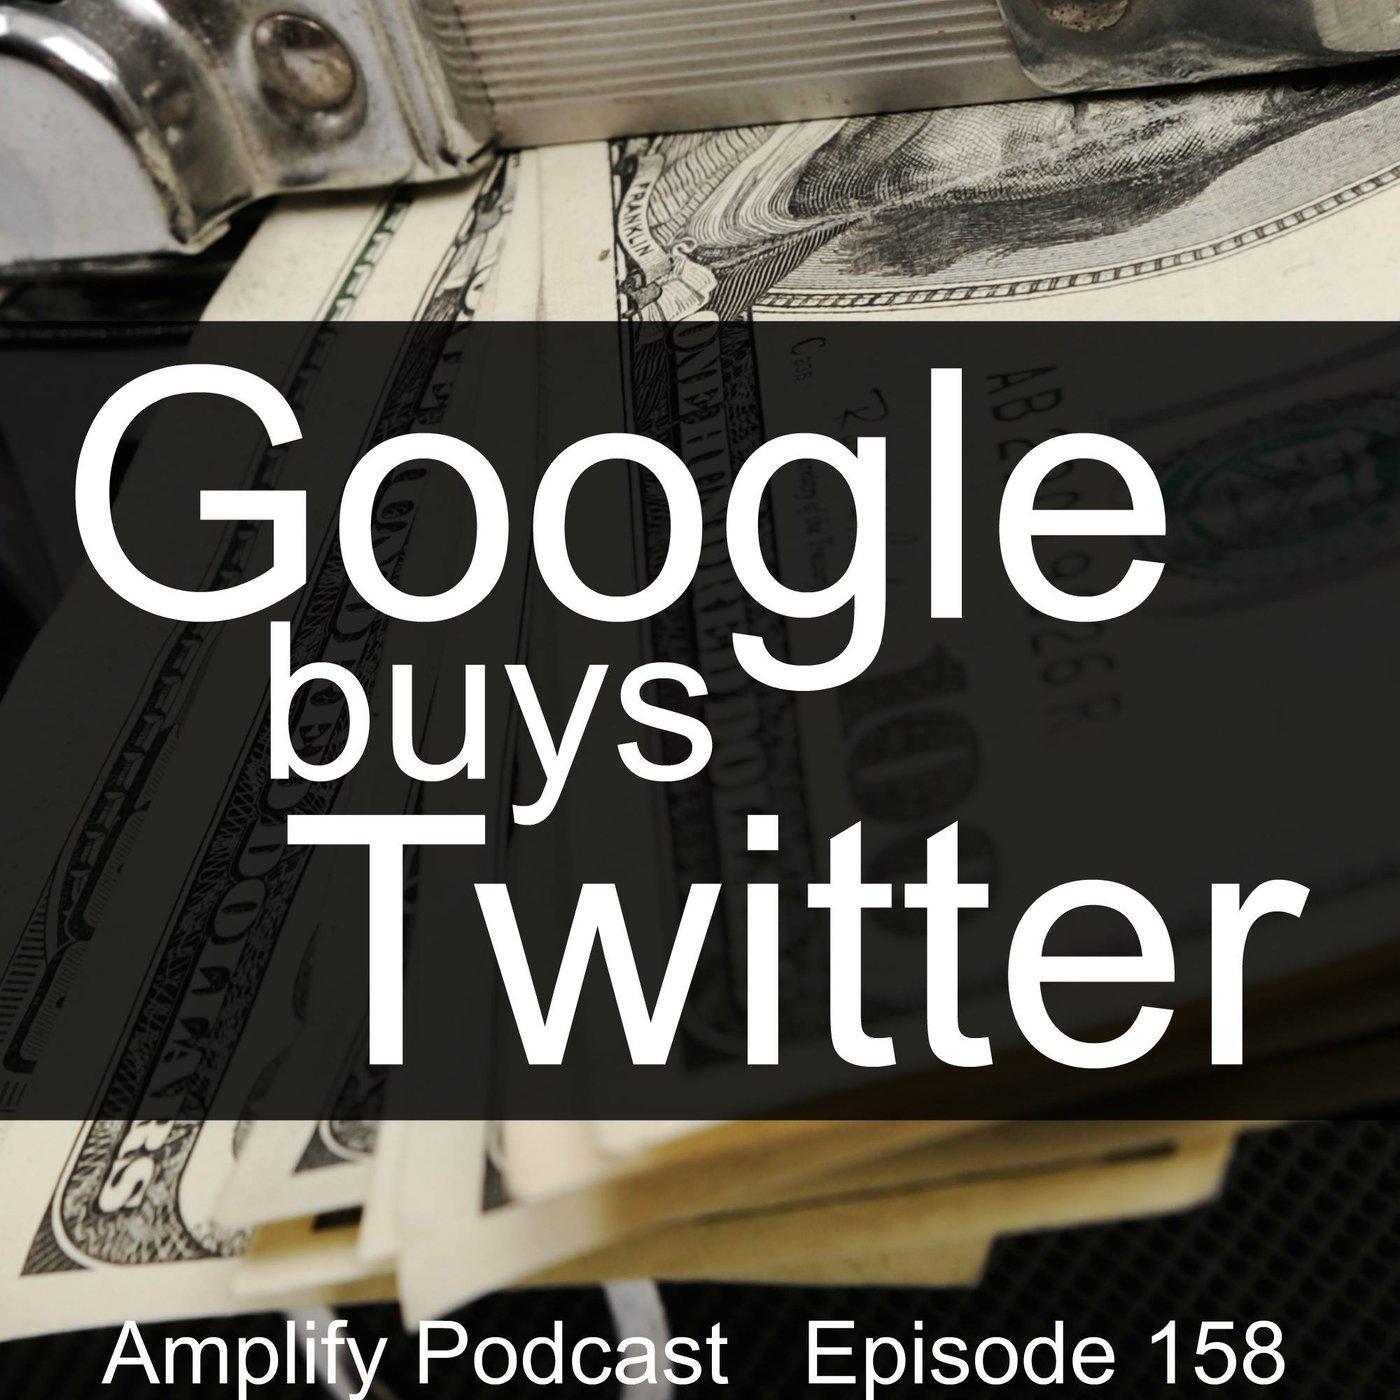 Google Buys Twitter